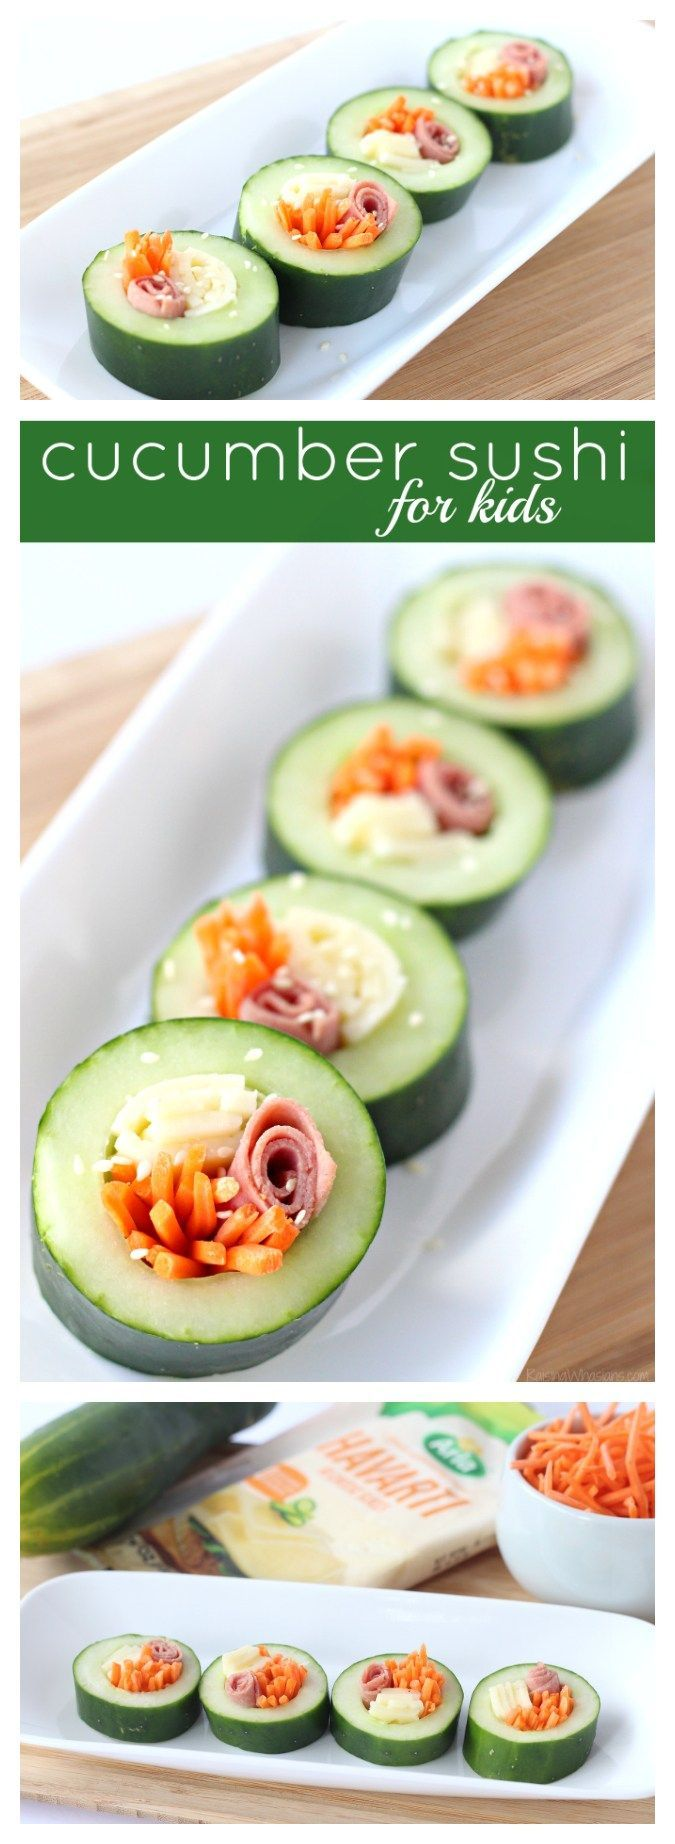 Easy Cucumber Sushi for Kids - Raising Whasians